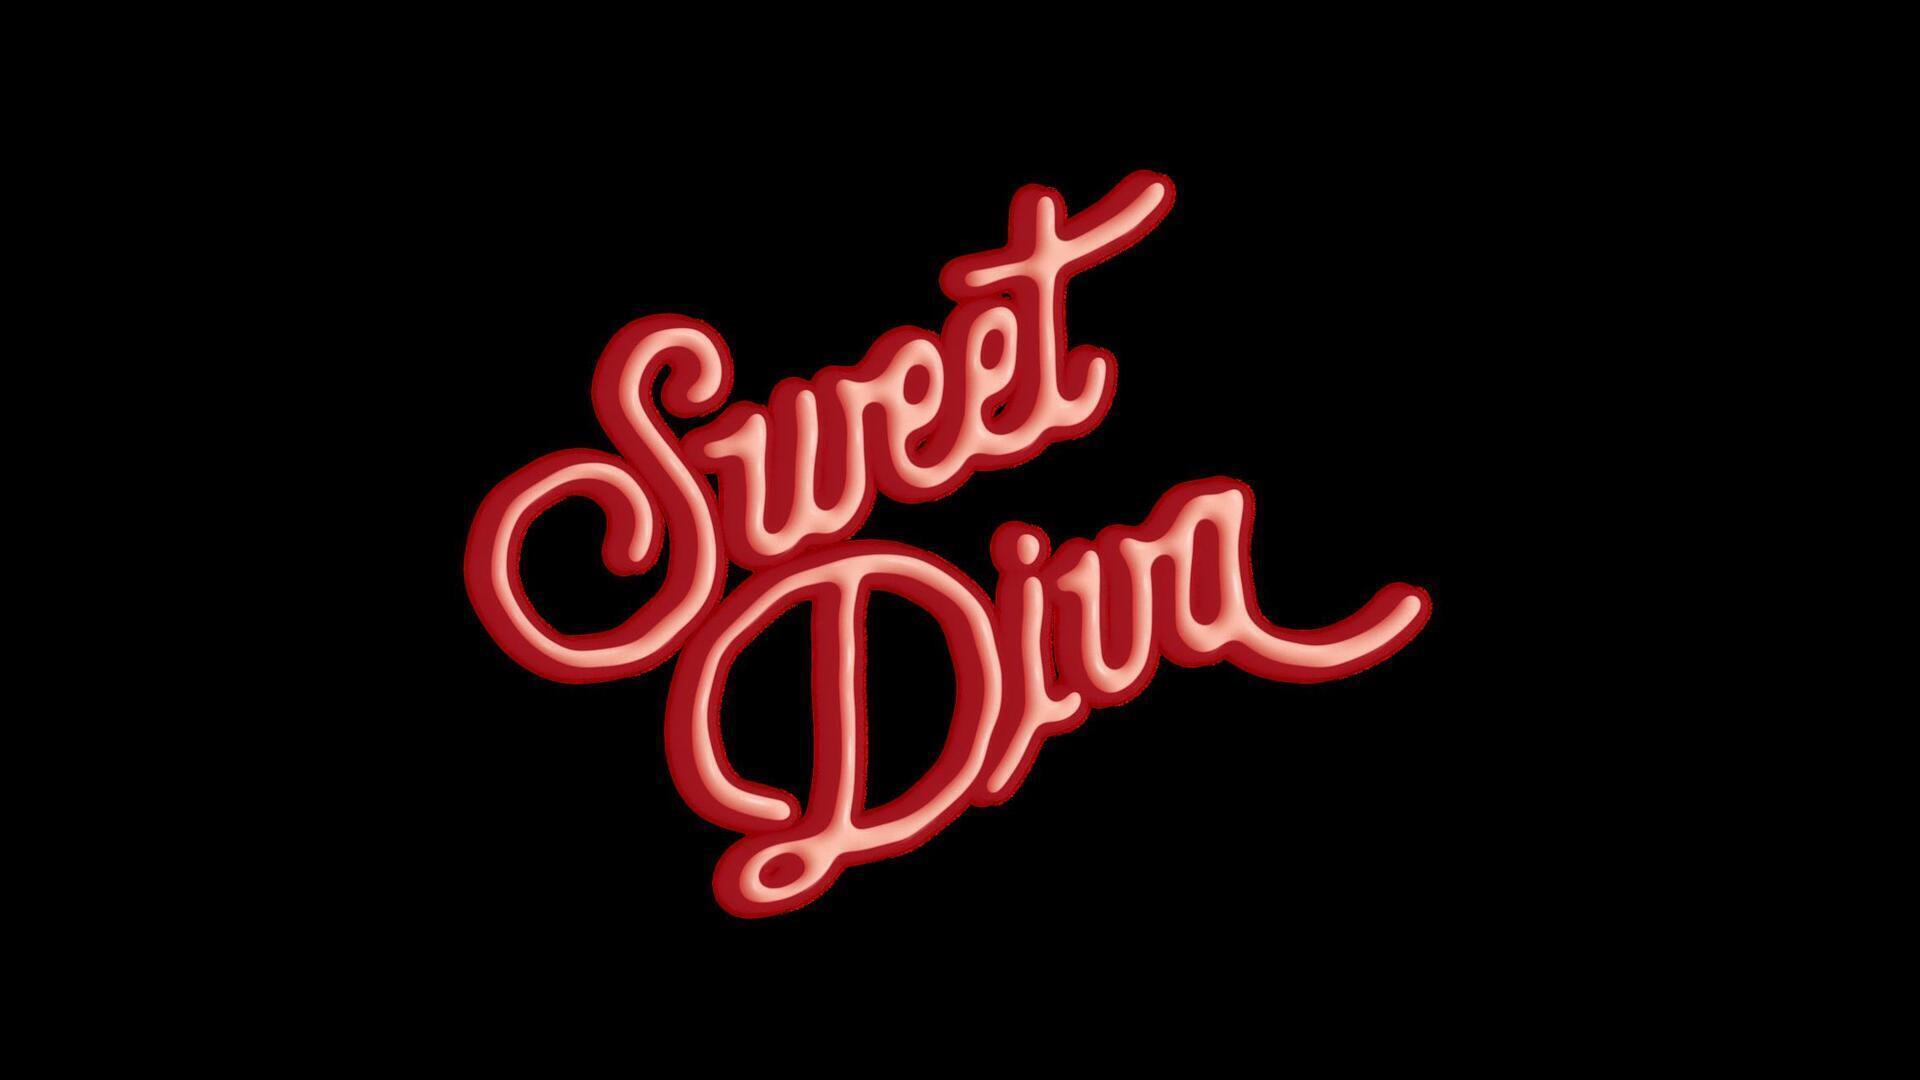 Sweet diva